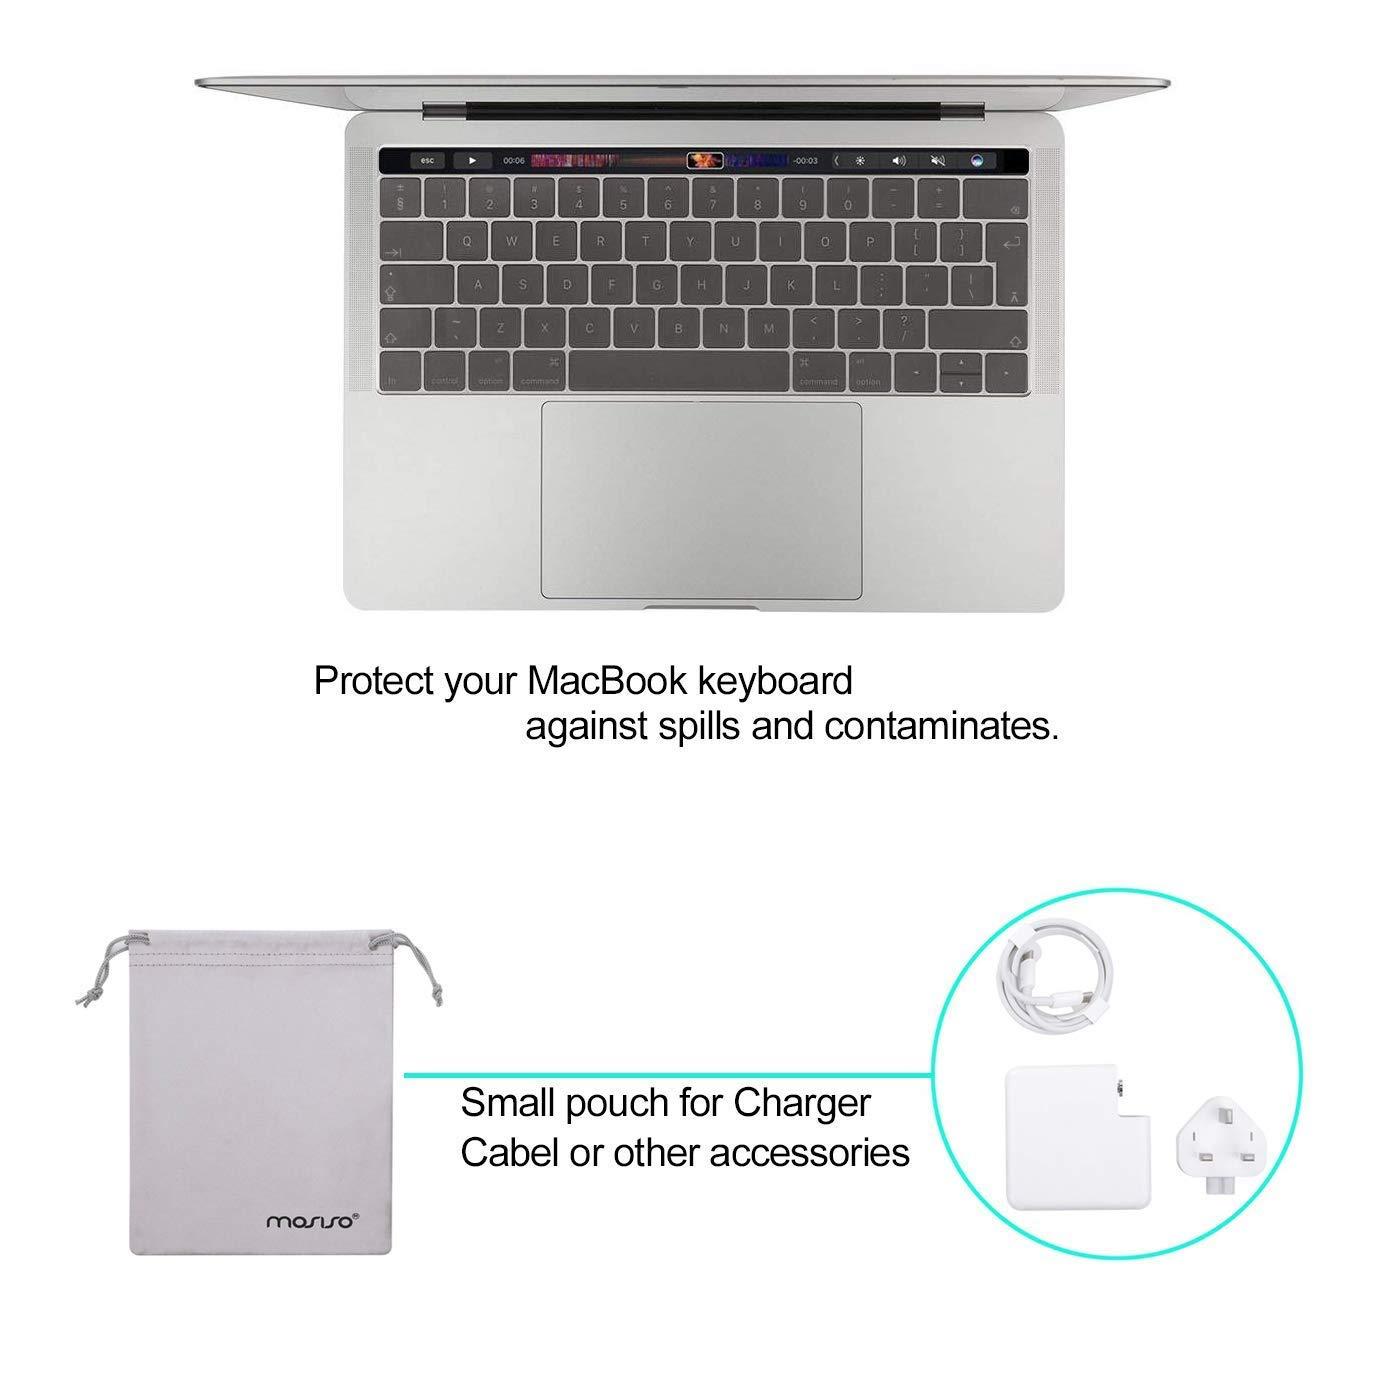 R/ígido Carcasa /& Cubierta de Teclado /& Protector de Pantalla /& Accesorios Bolsa MOSISO Funda Dura Compatible con 2019 2018 2017 2016 MacBook Pro 13 USB-C A2159 A1989 A1706 A1708 Azul Serenidad